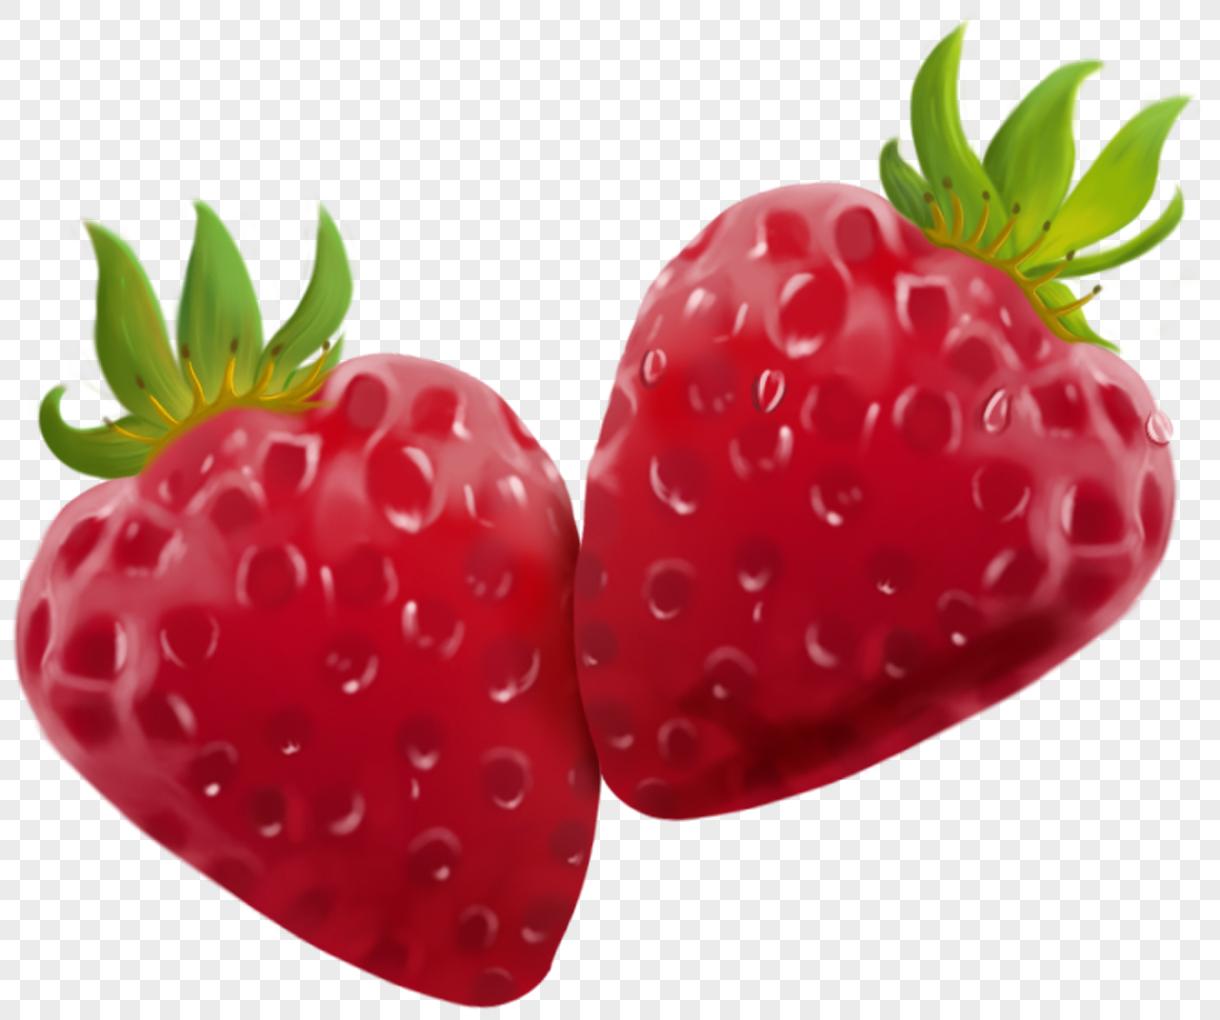 contoh gambar mewarnai buah strawberry